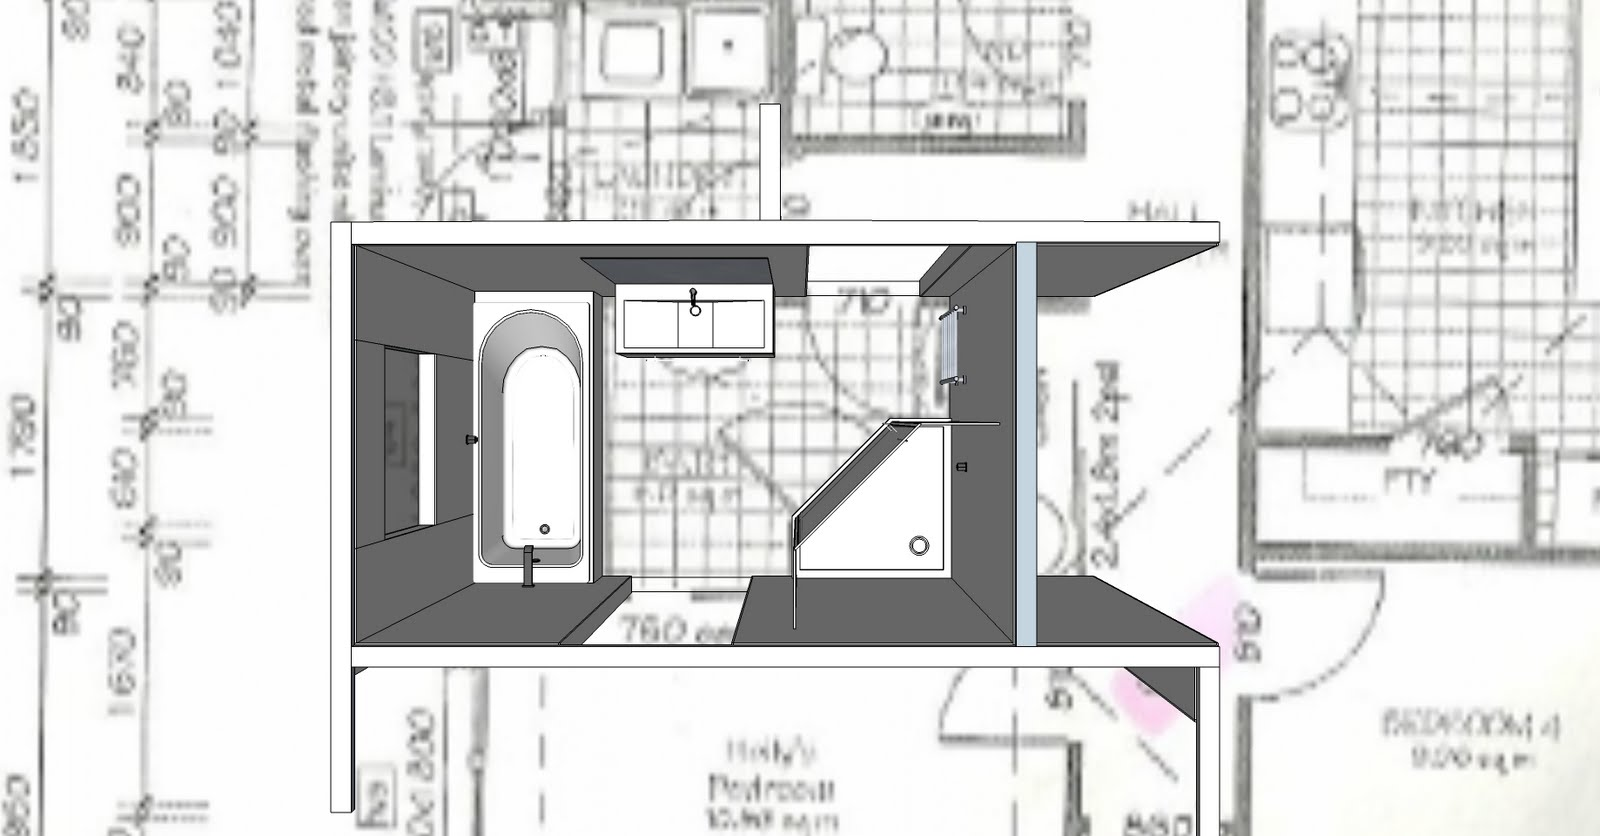 The Bath Room 2: Tuesday_Sketchup model